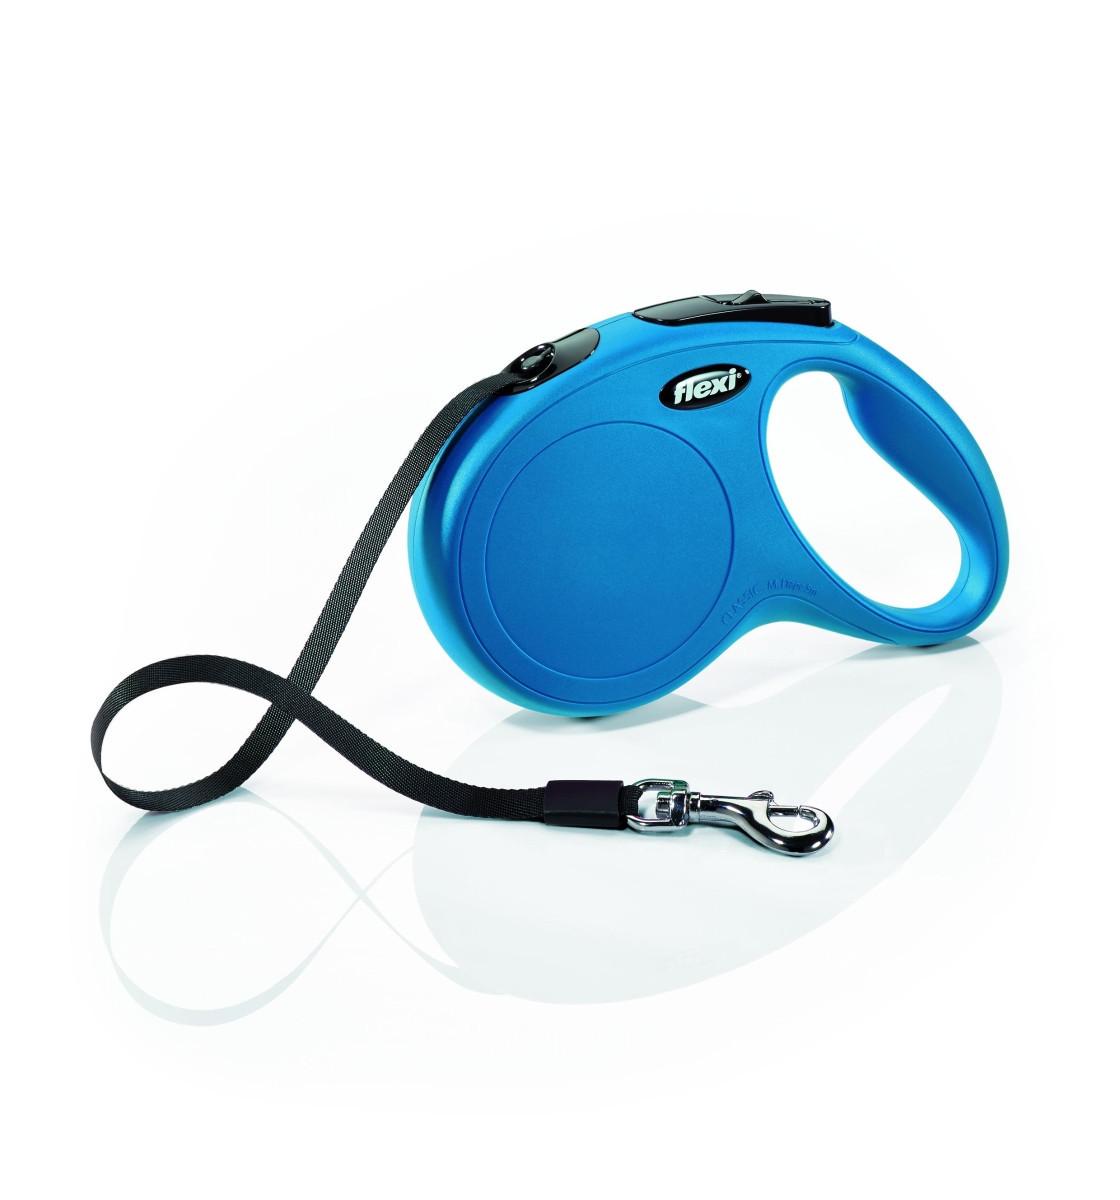 Поводок рулетка ФЛЕКСИ FLEXI New Classic M, для собак весом до 25 кг, лента 5 метров, цвет синий